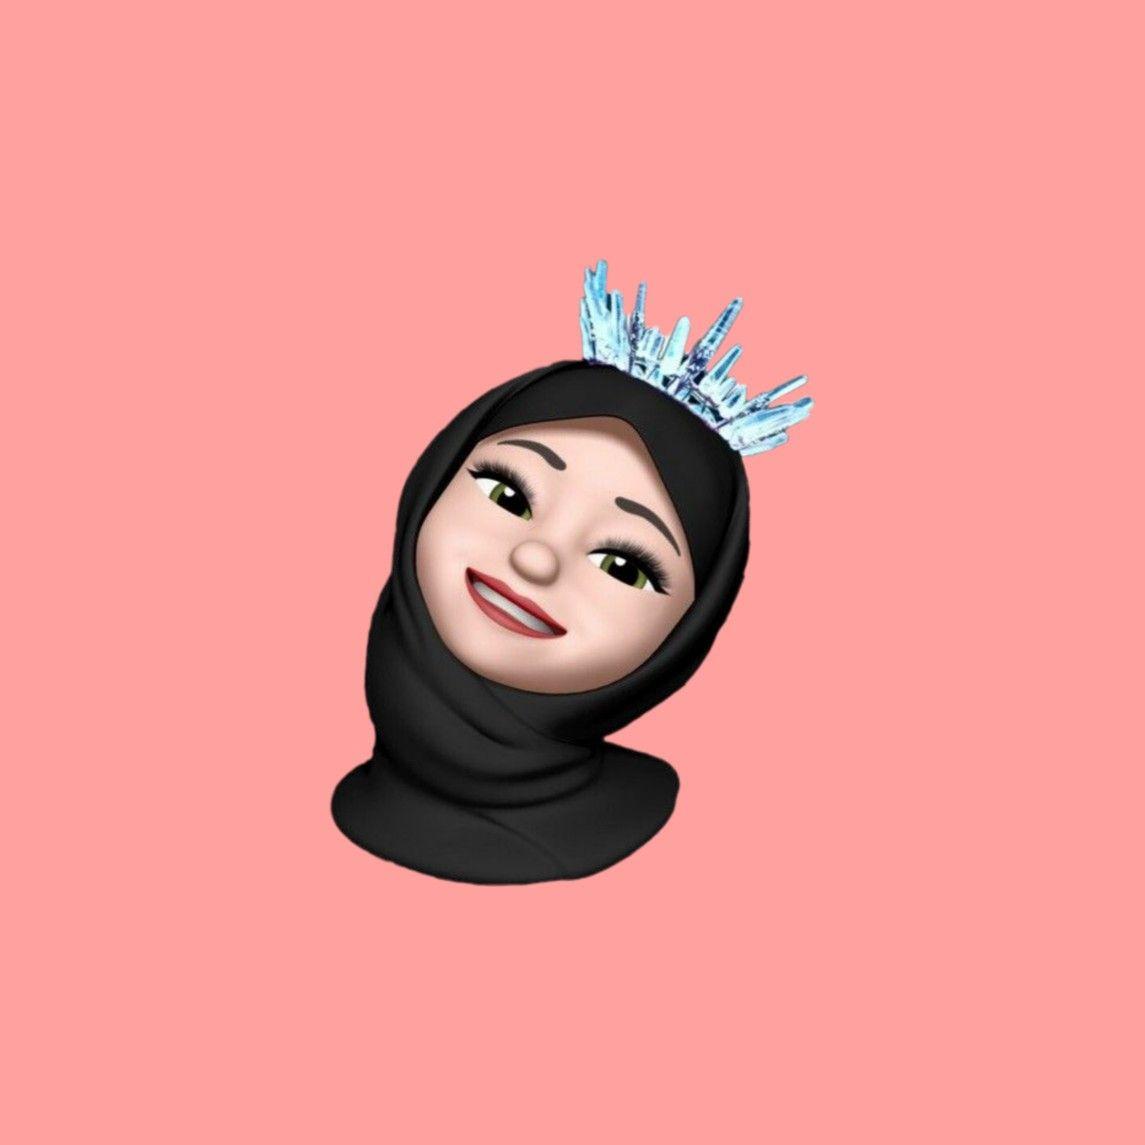 Anime dp for girls whatsapp dp images profile picture. Wallpaper Profil Whatsapp Instagram Kartun